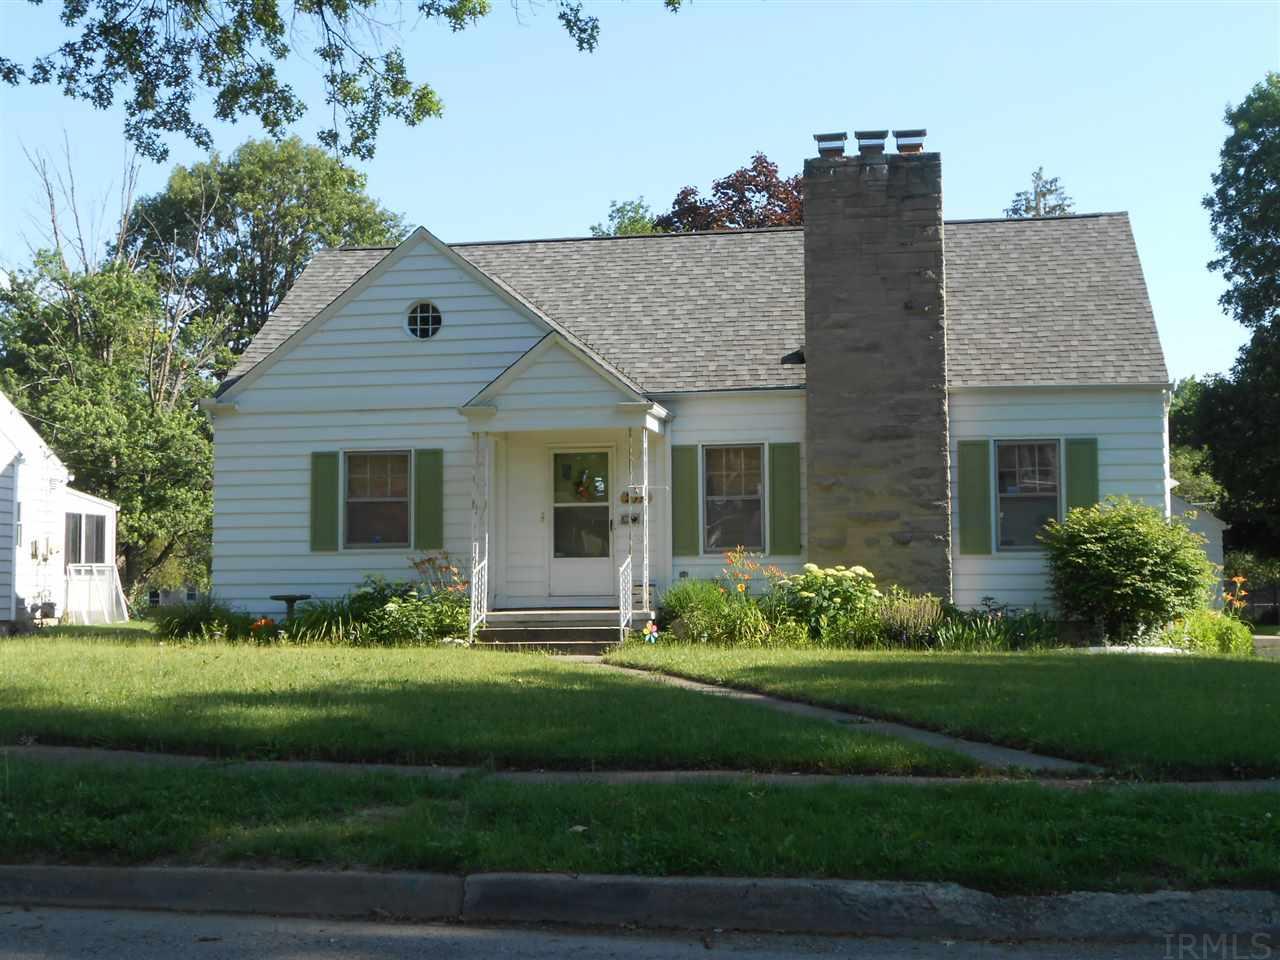 216 W Maplegrove, Fort Wayne, IN 46807